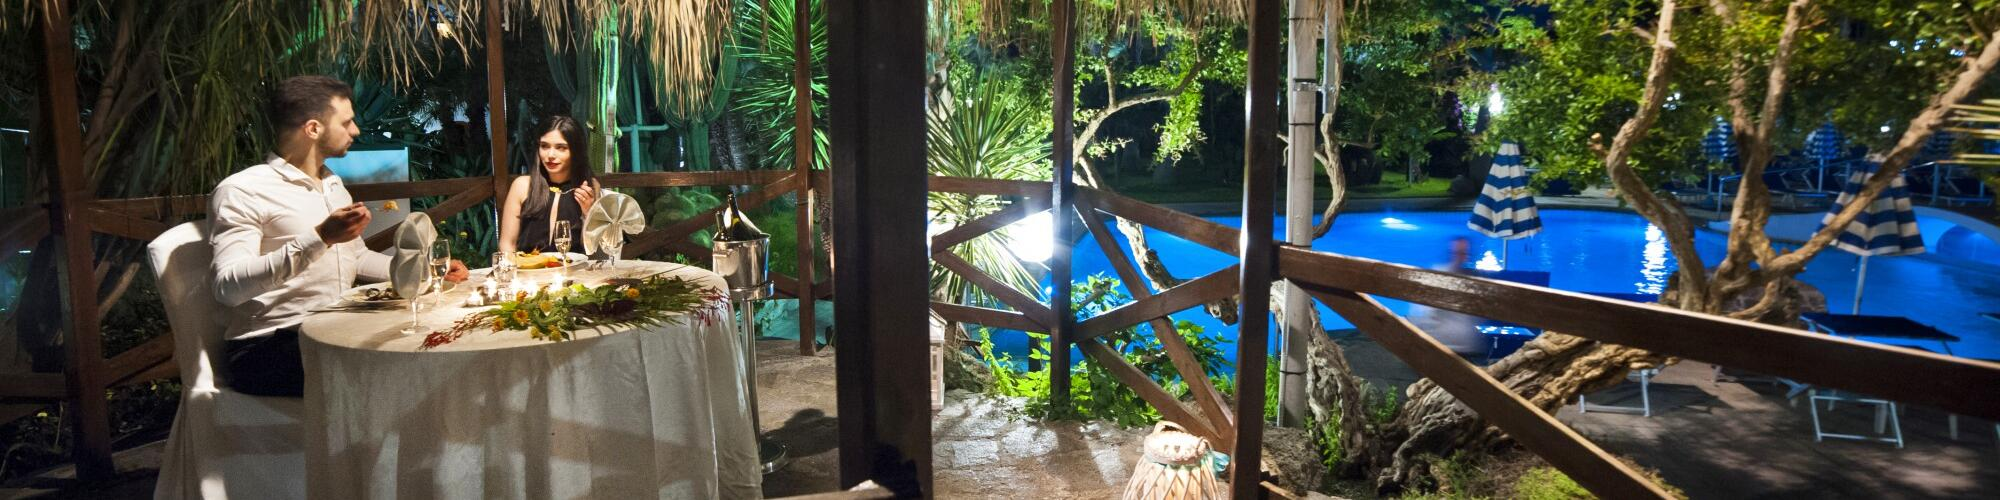 Offerta Romantic & Spa per coppie ad Ischia